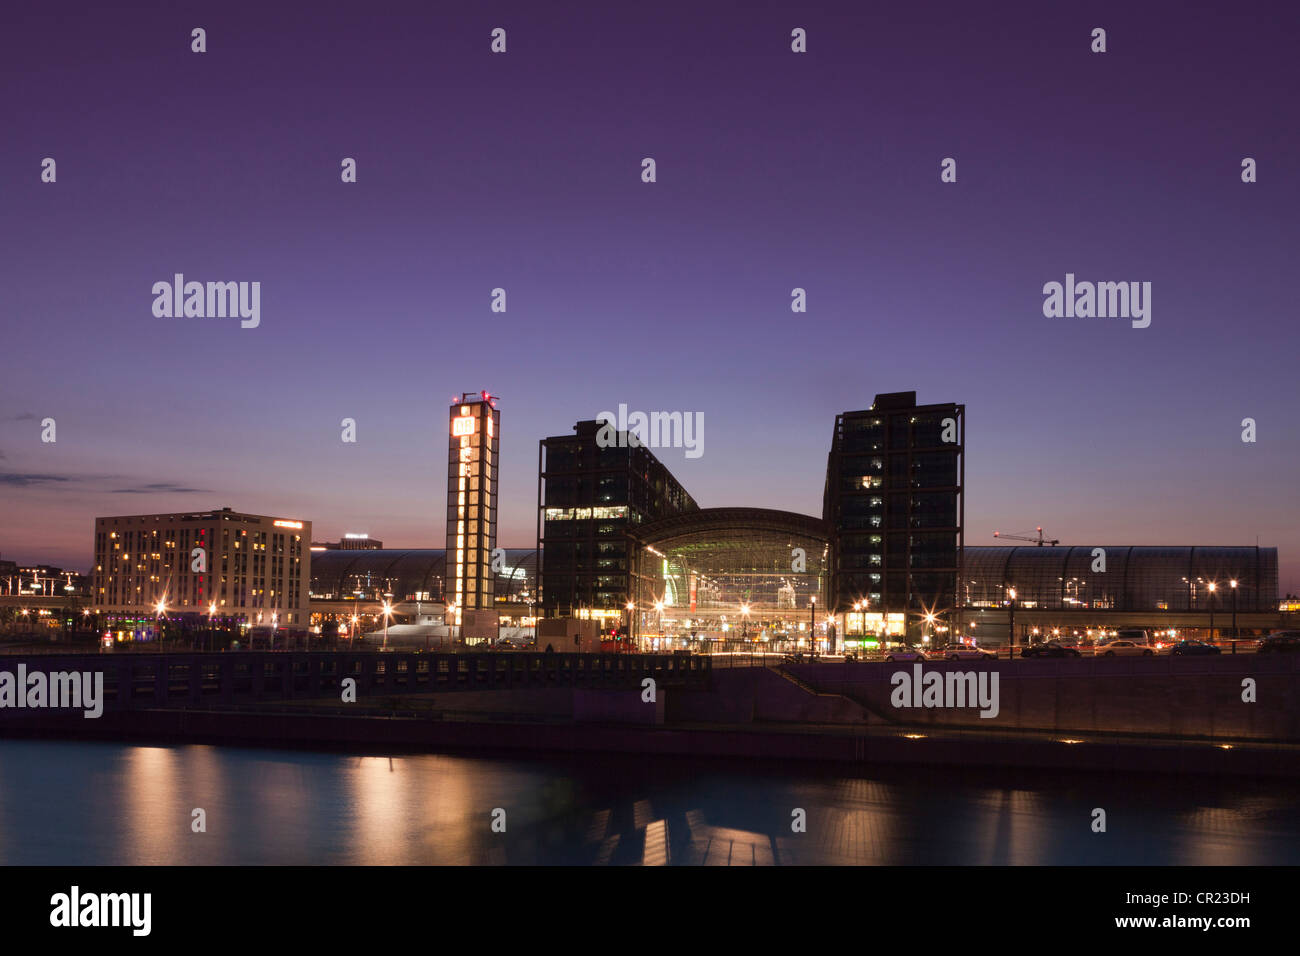 City skyline lit up at night - Stock Image